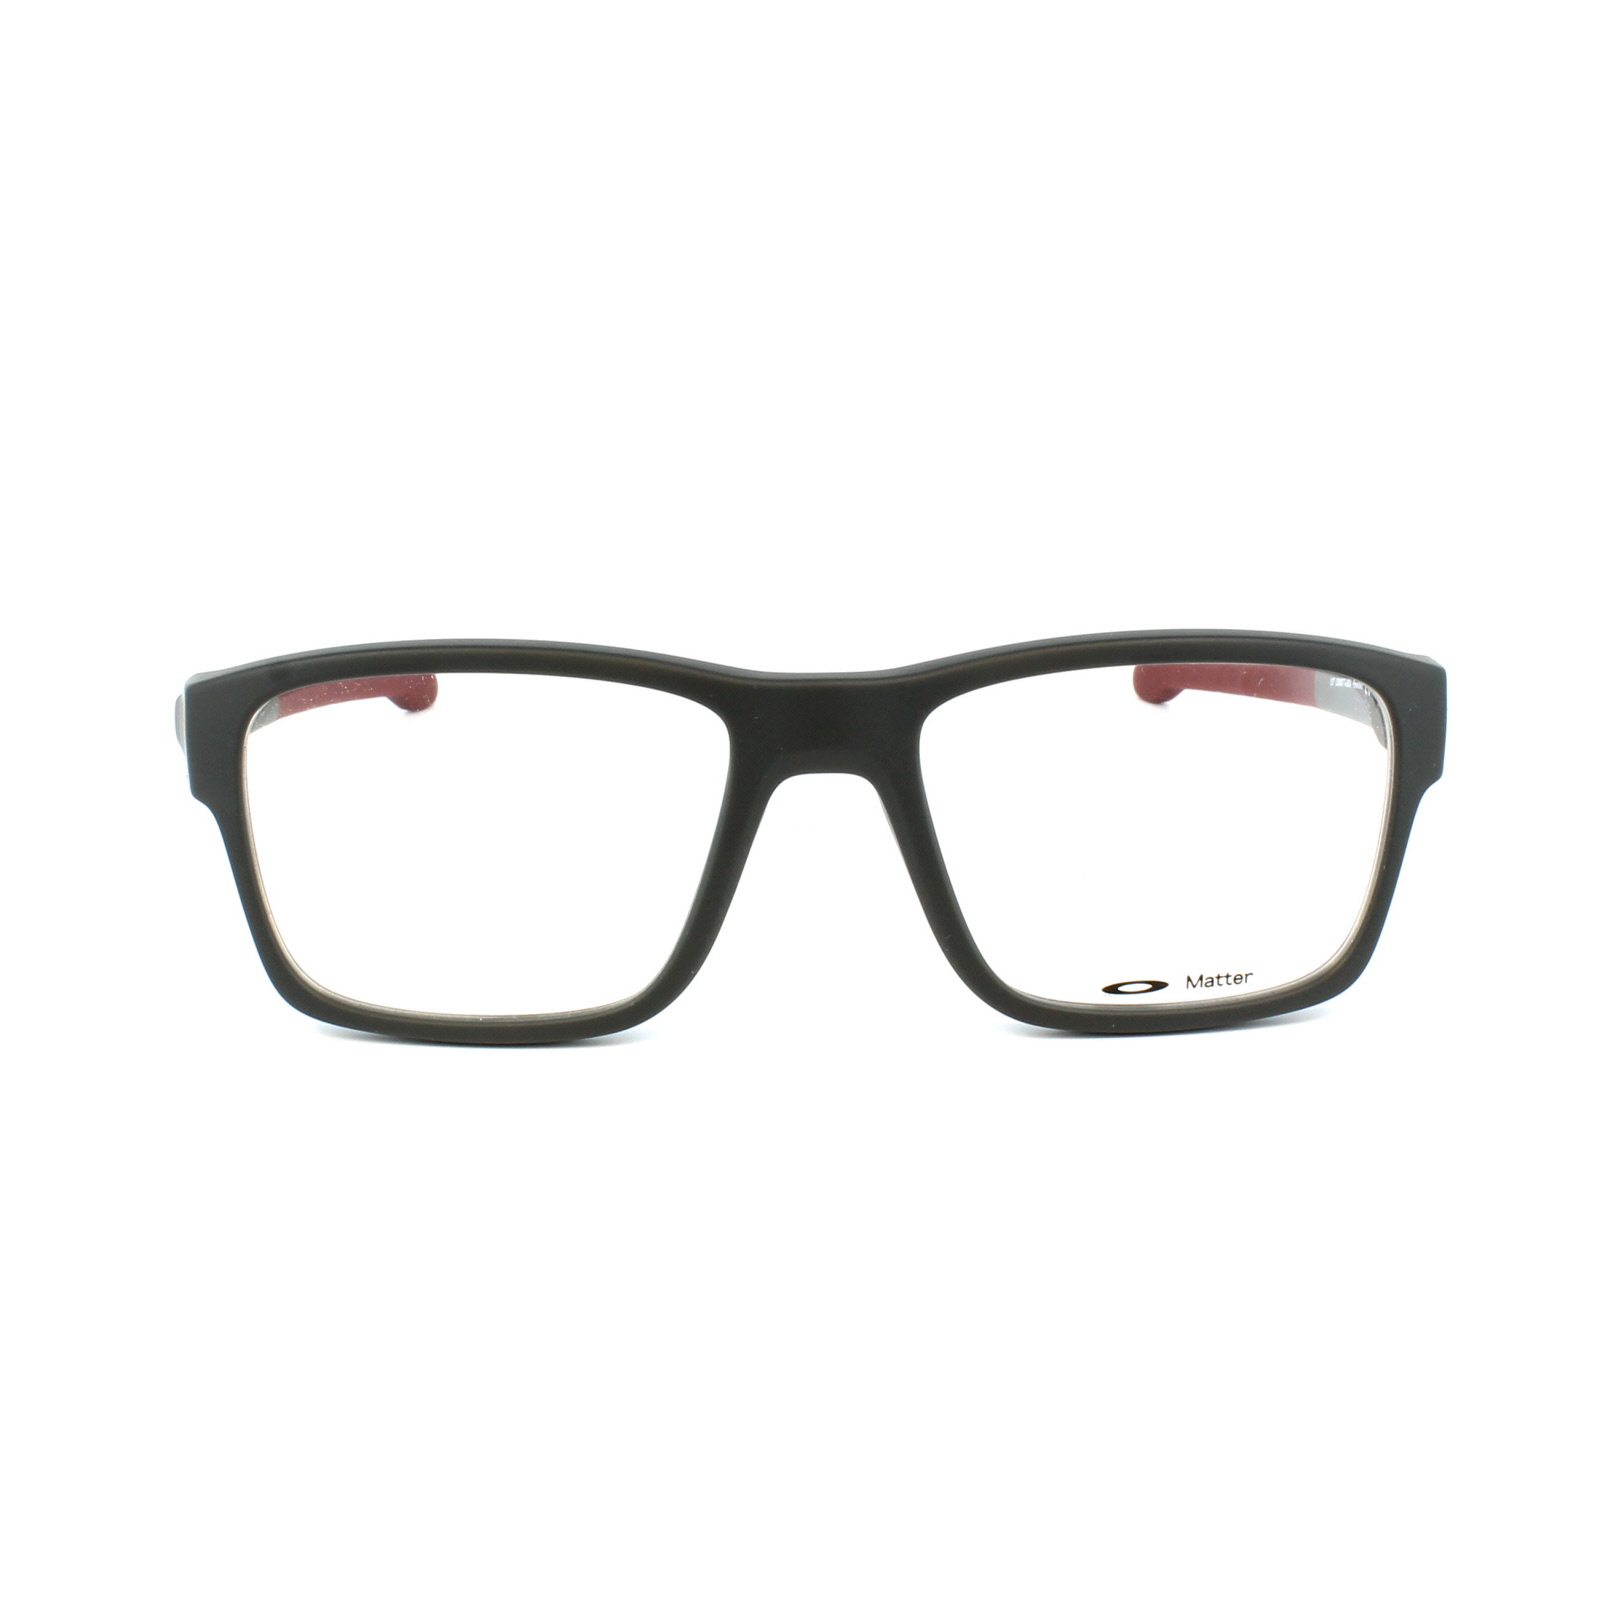 1449e570ad Oakley Splinter Glasses Frames Thumbnail 1 Oakley Splinter Glasses Frames  Thumbnail 2 ...